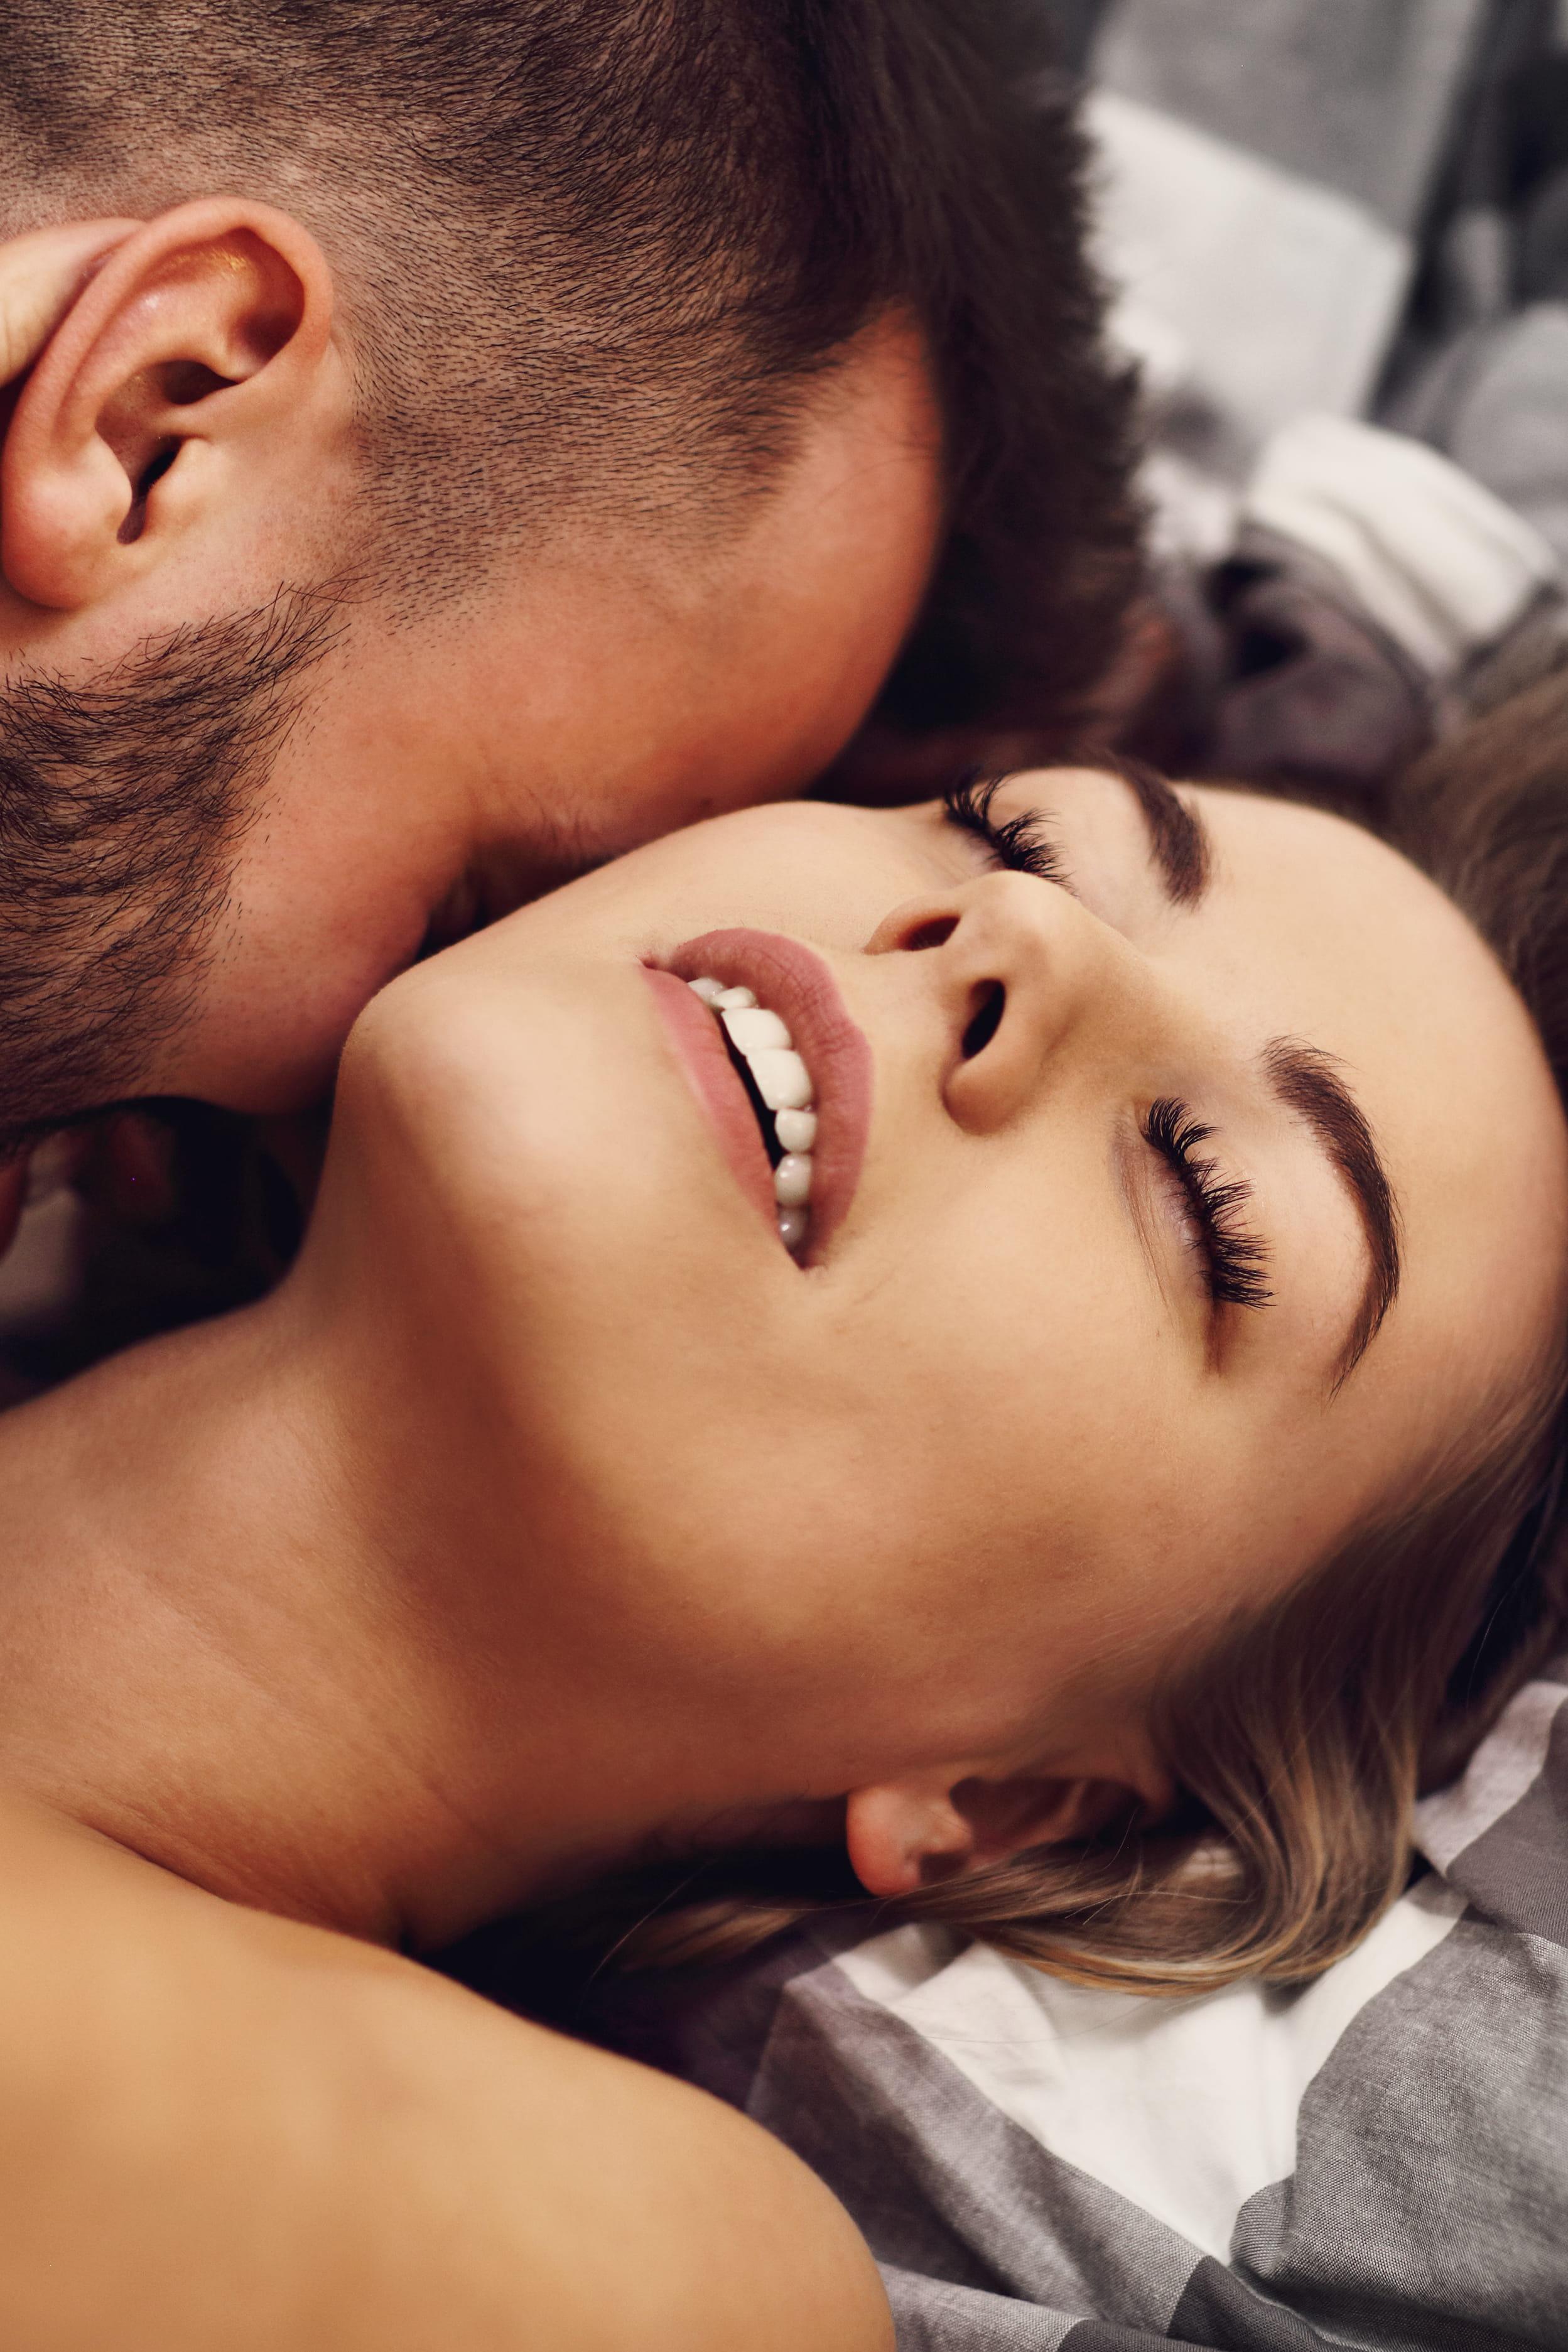 Rapport Sexuel Trop Intense Les Risques